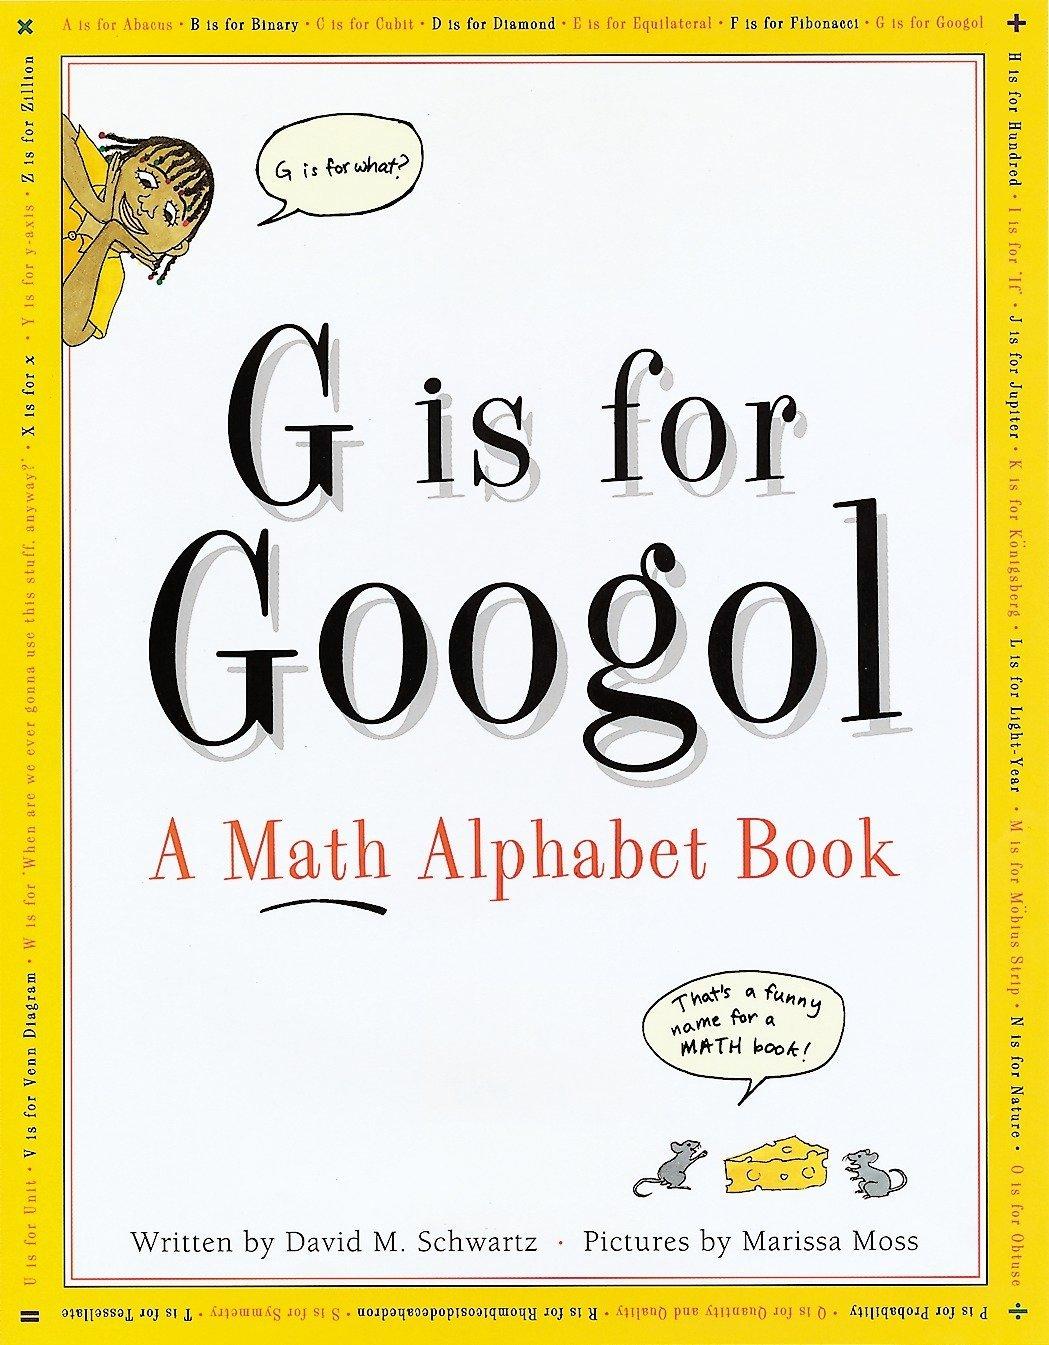 G Is for Googol: A Math Alphabet Book: David M. Schwartz: 0028195725898:  Amazon.com: Books